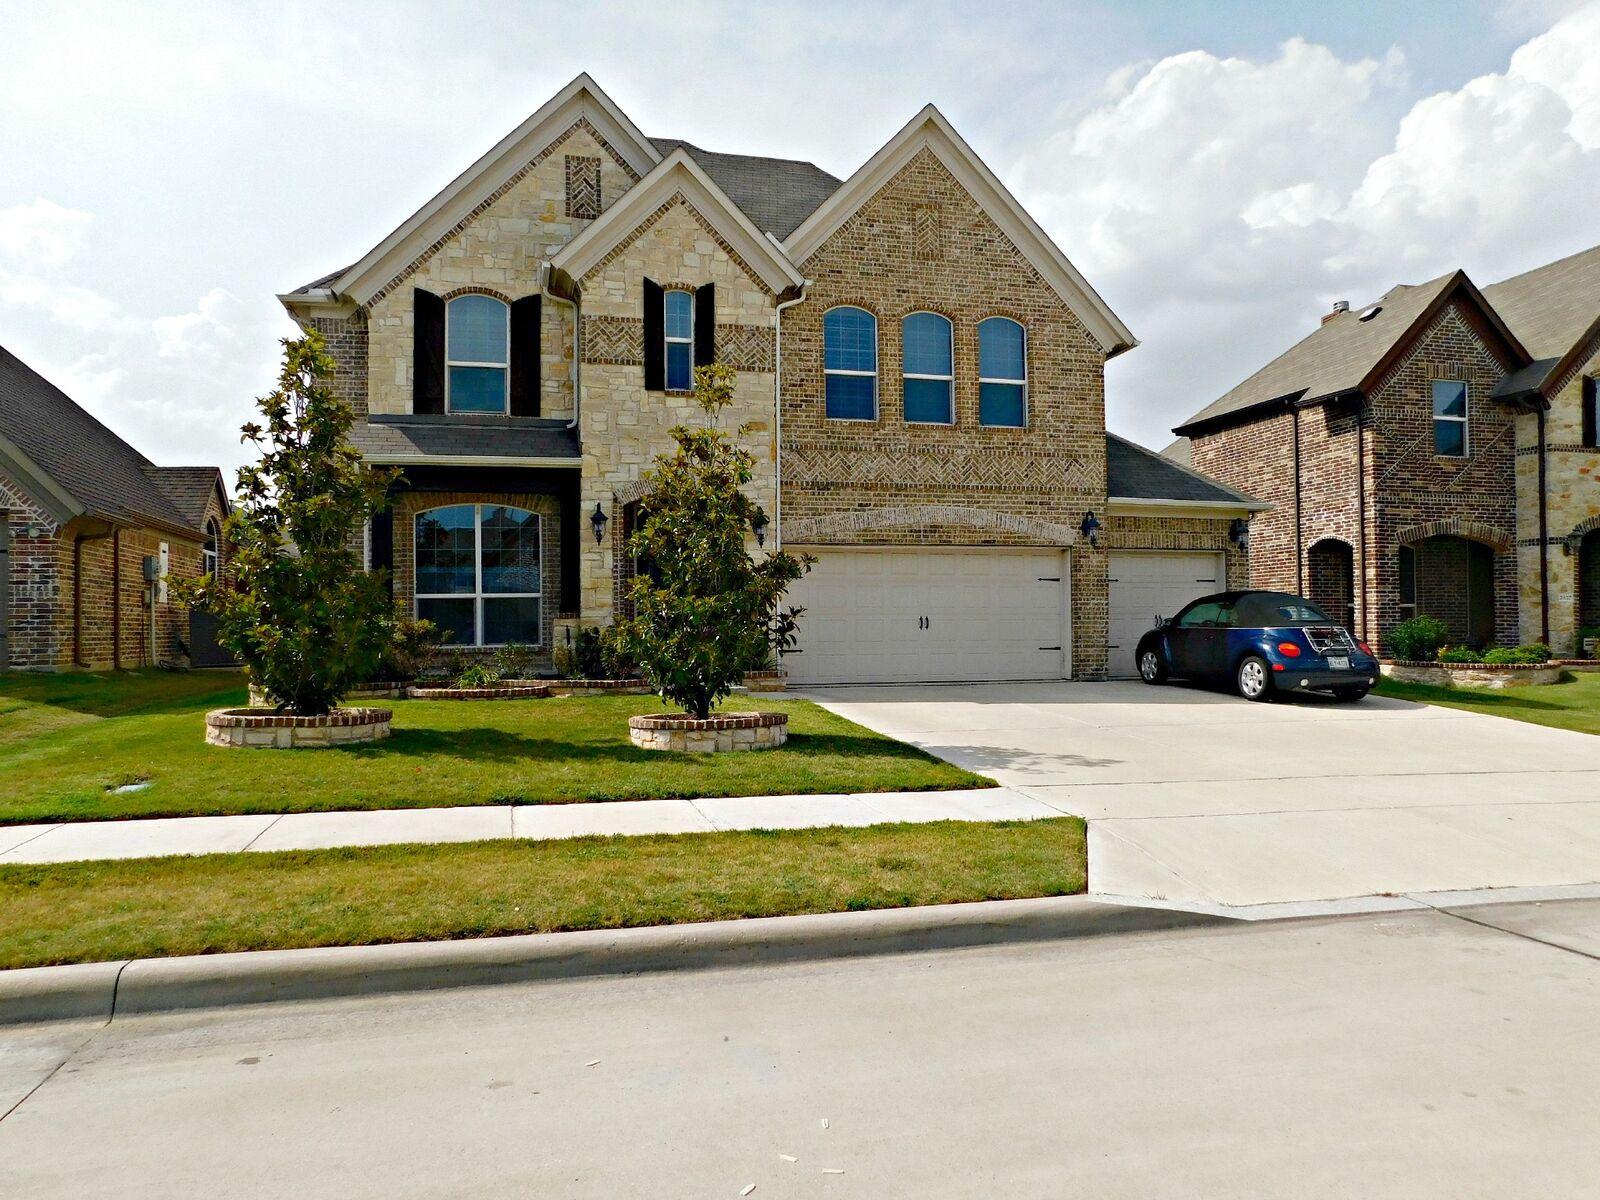 Photo of 2433 Valley Glen Drive, Little Elm, TX, 75068